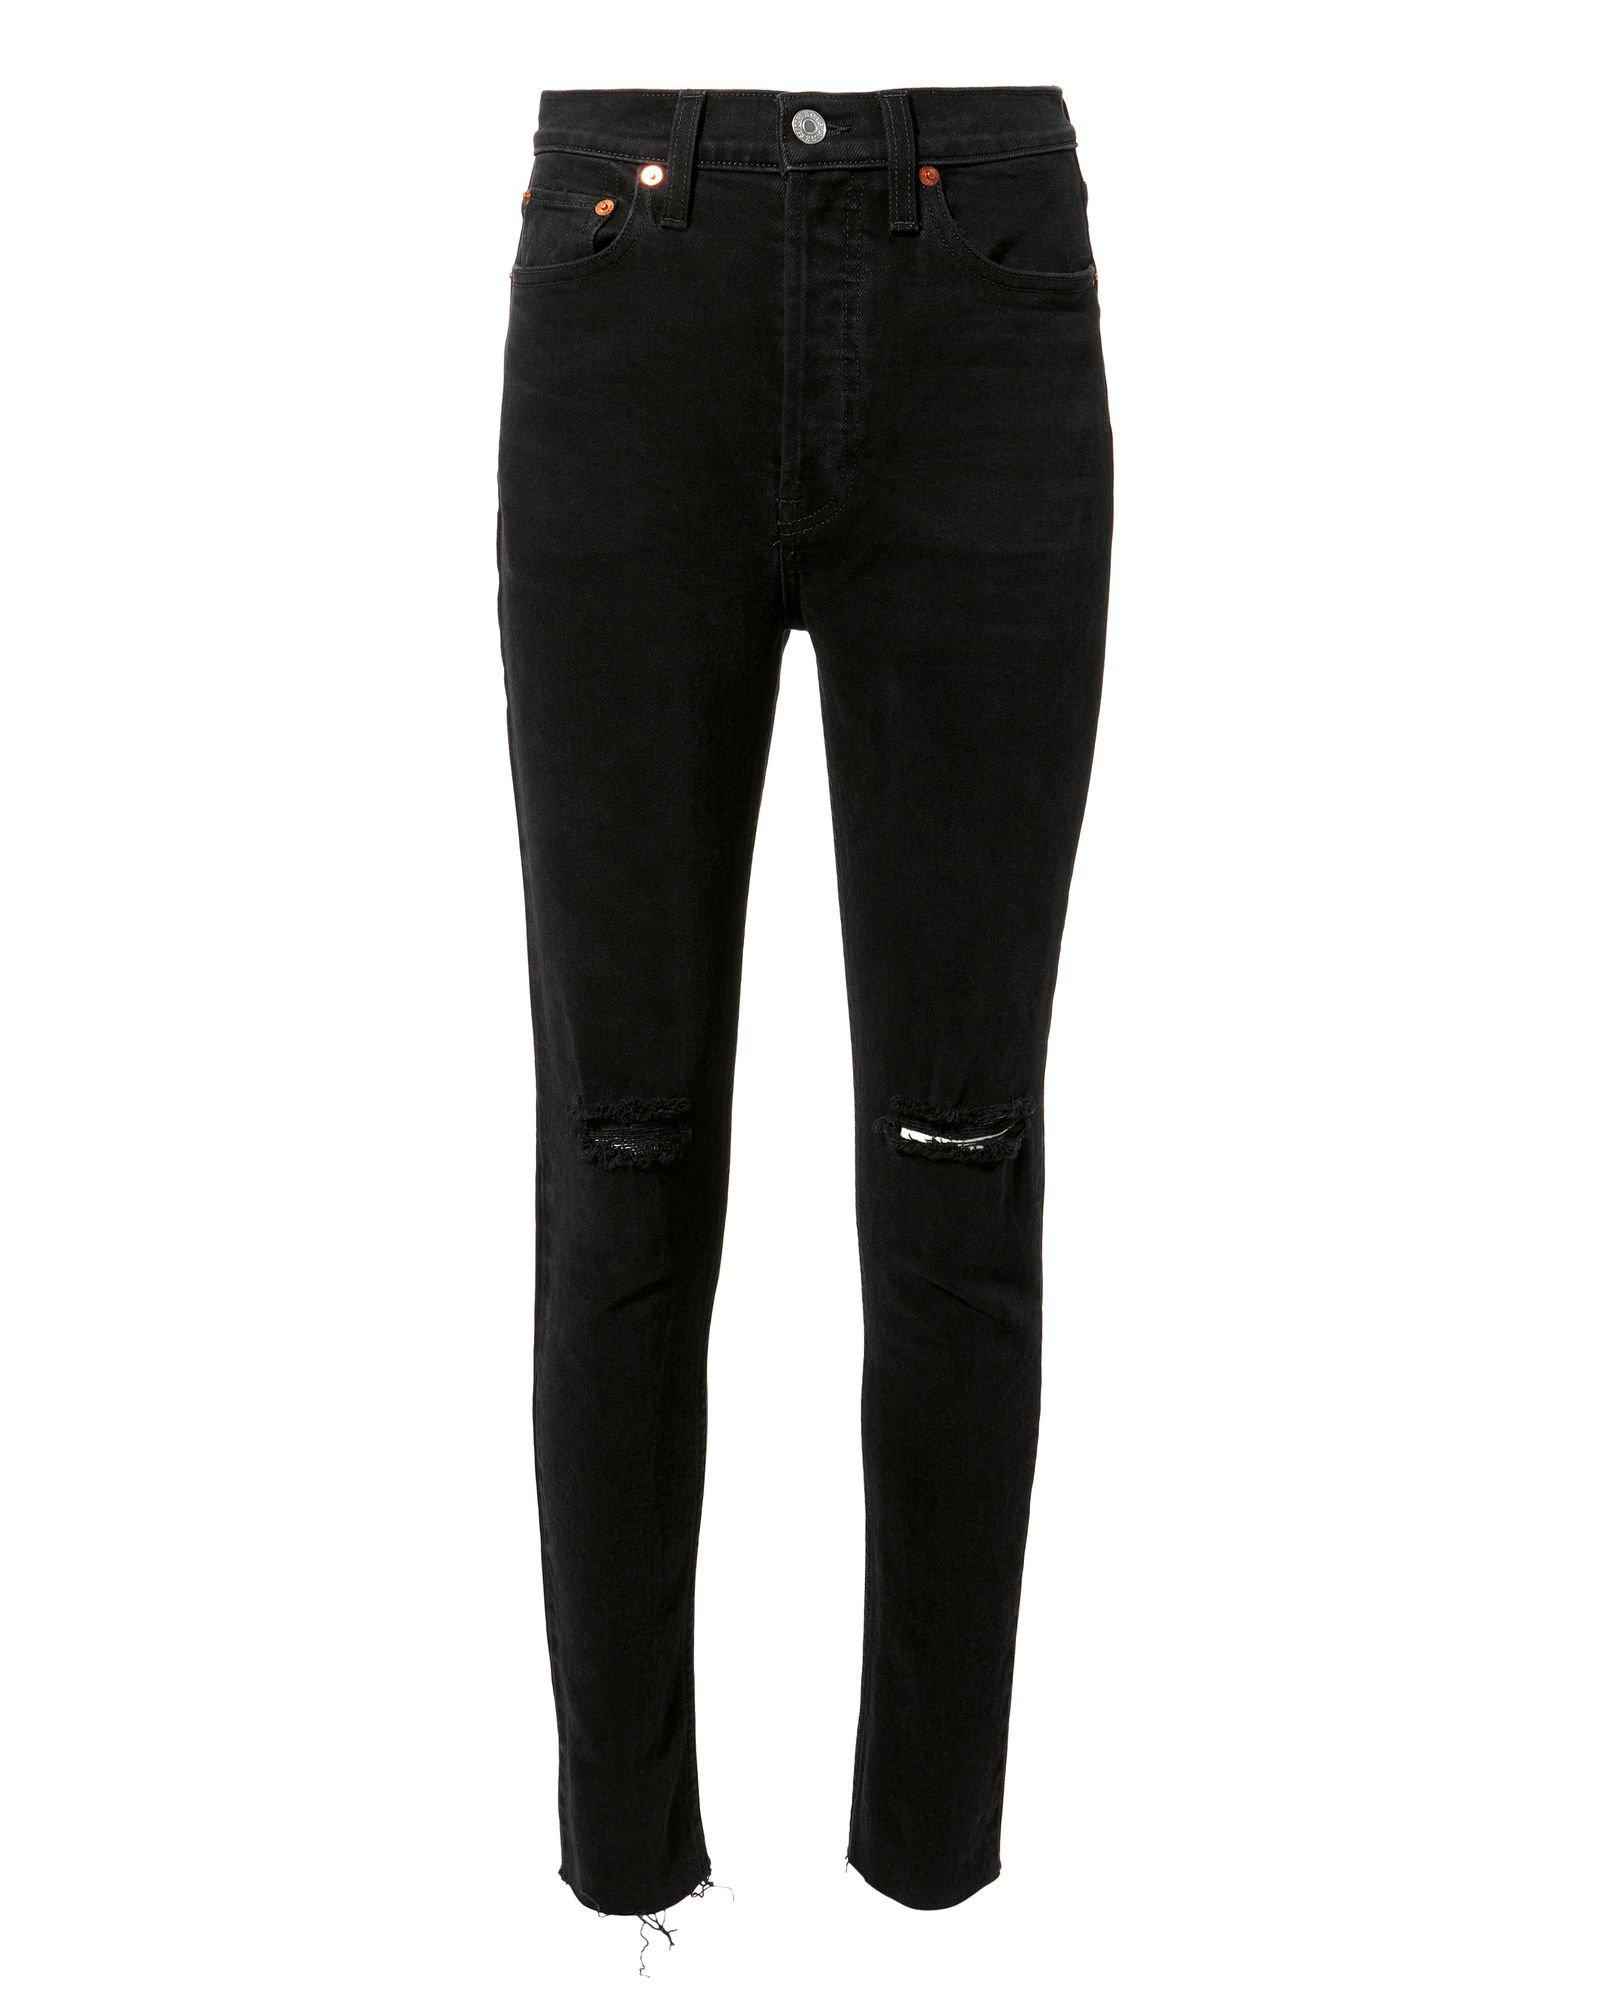 High-Rise Black Destroyed Crop Jeans